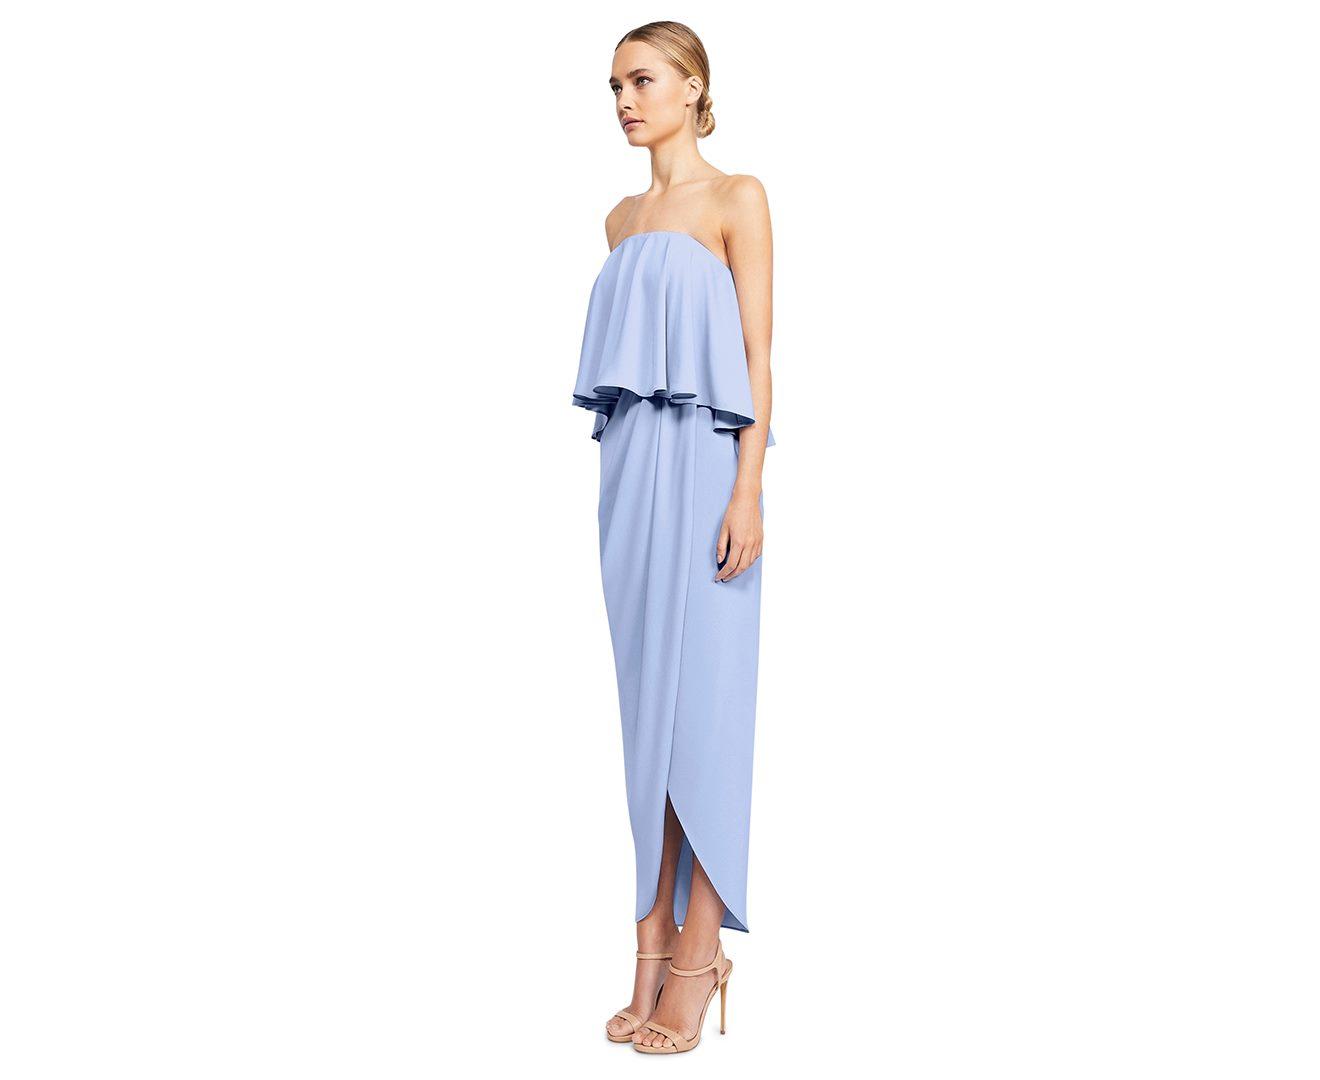 d0564bfbc135 Shona Joy Women's Core Strapless Frill Dress Cornflower Cocktail Party Dress  | Trade Me